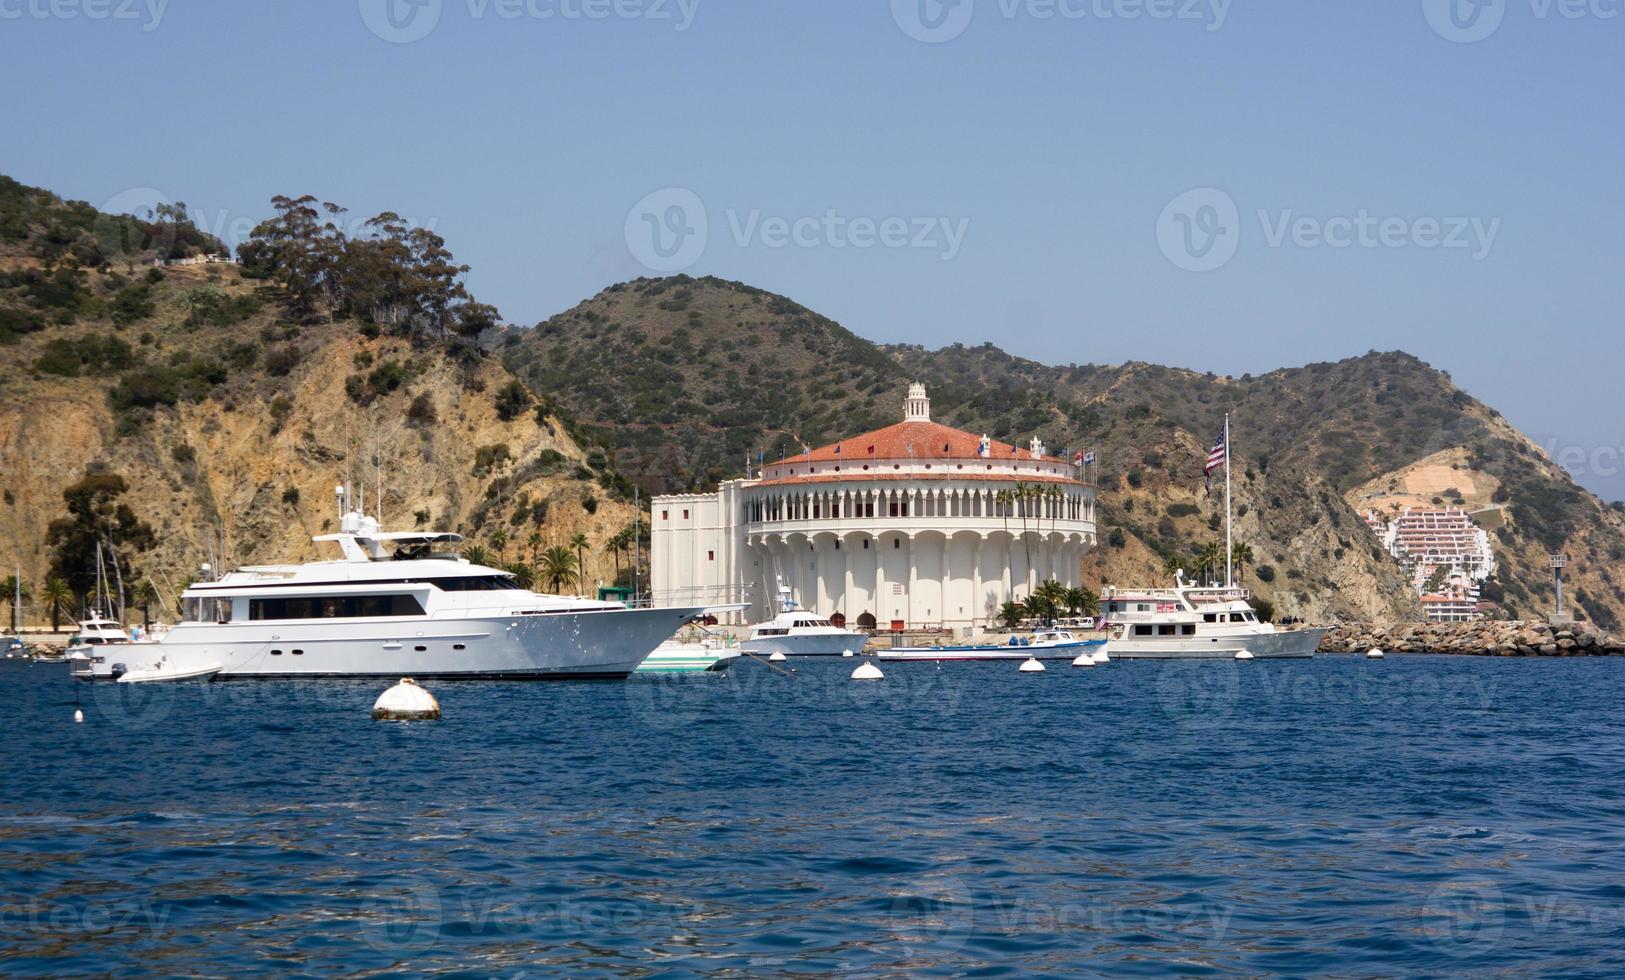 mega yacht i avalon hamn foto